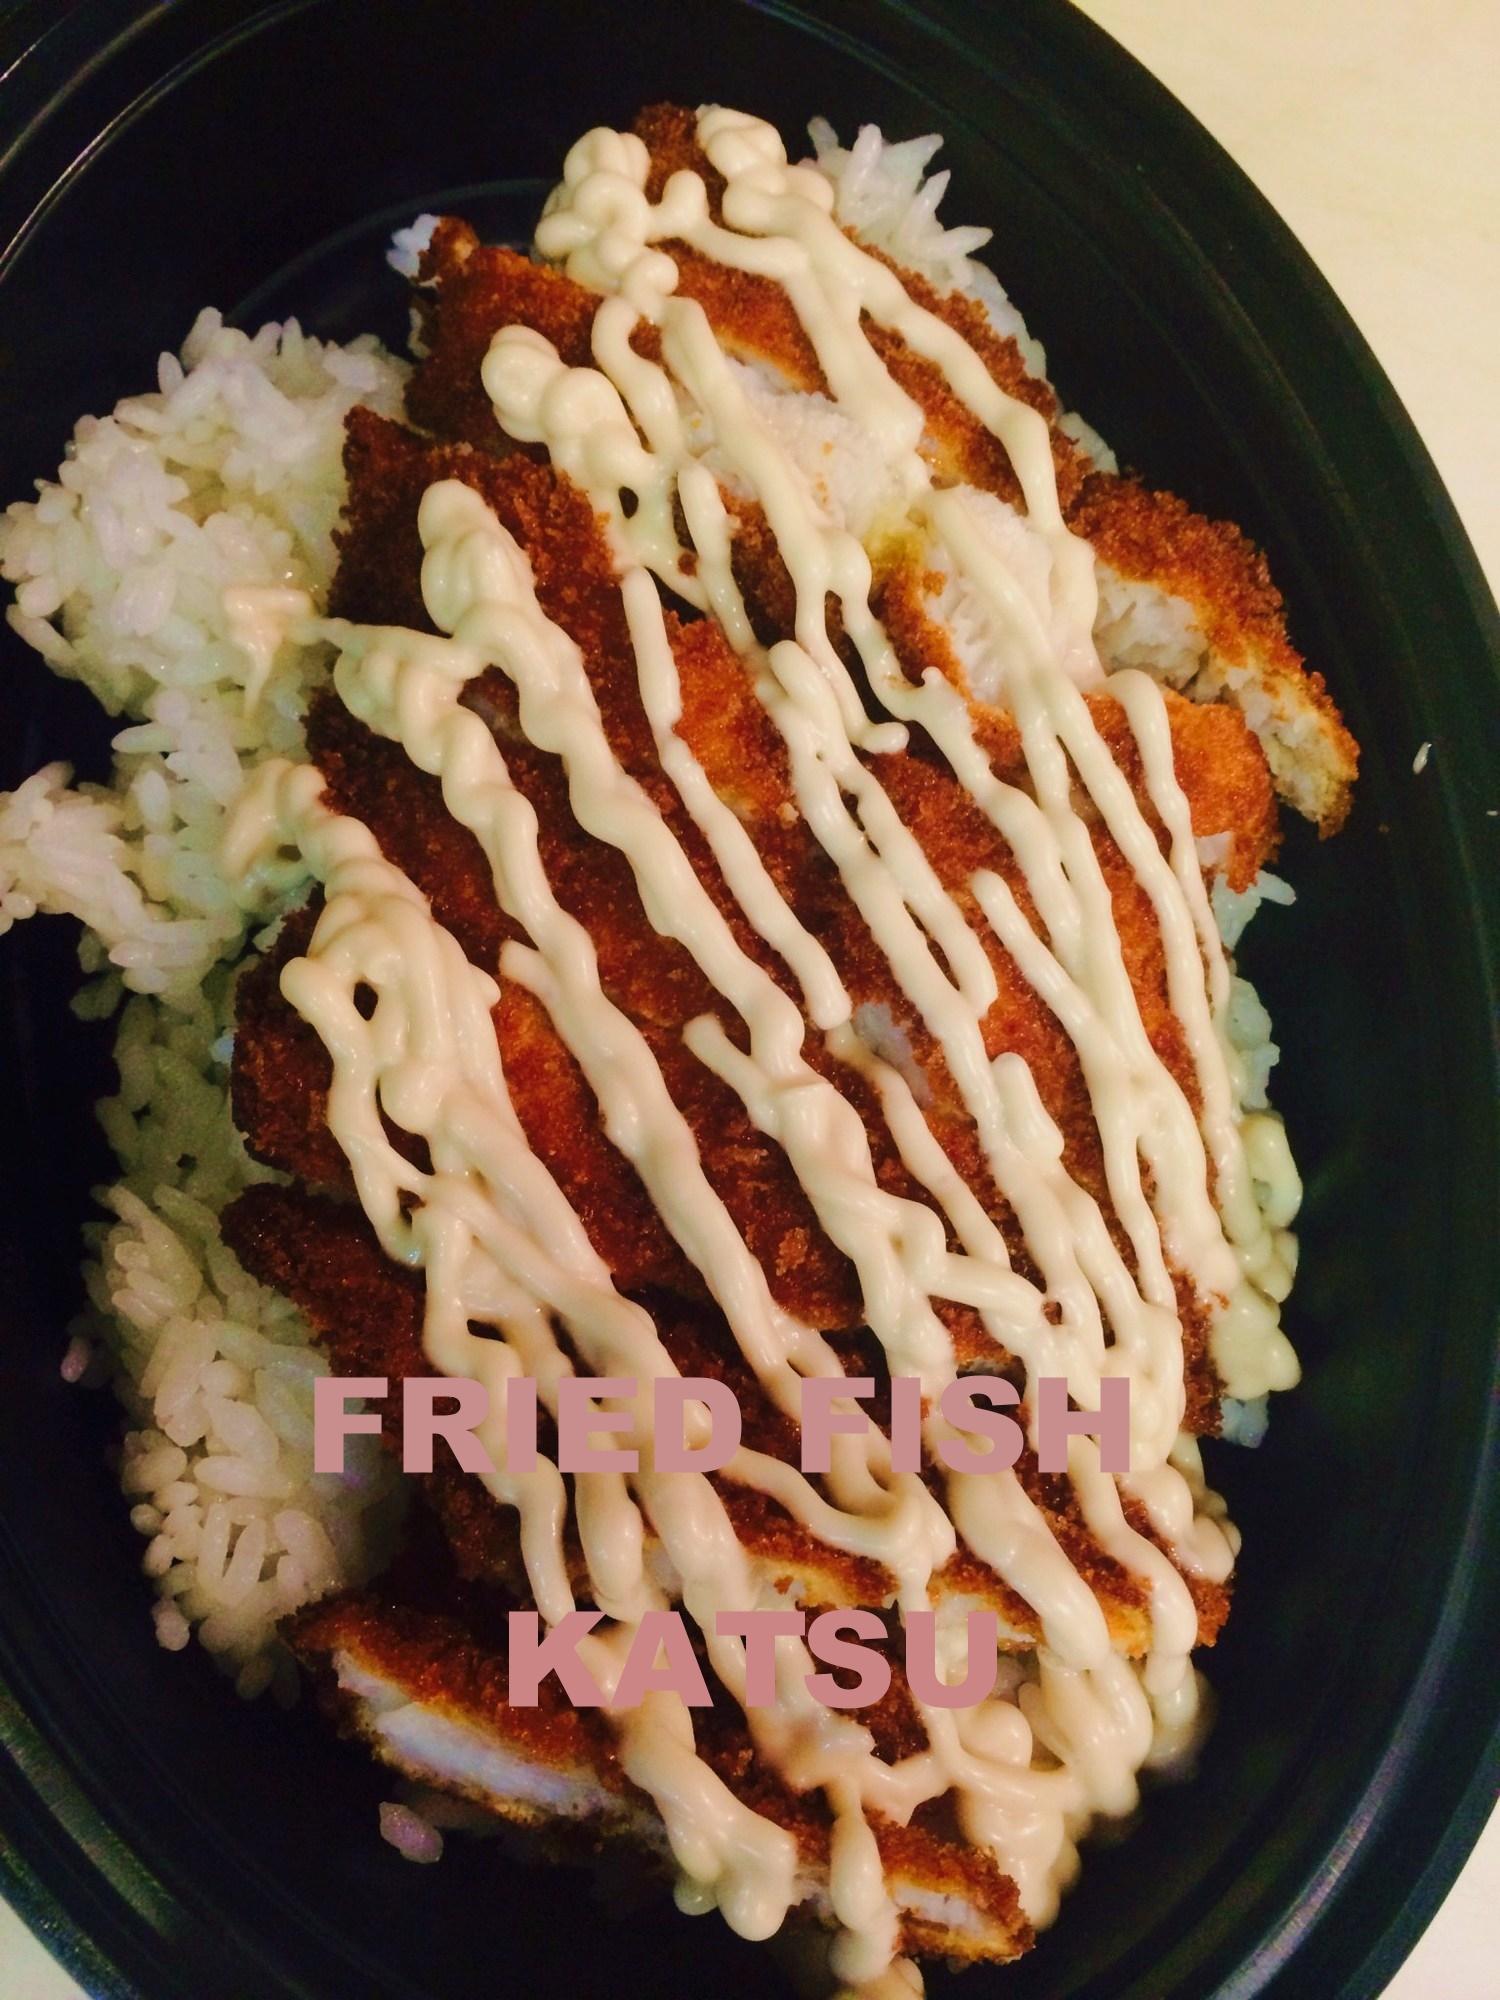 Fried Fish Katsu.JPG